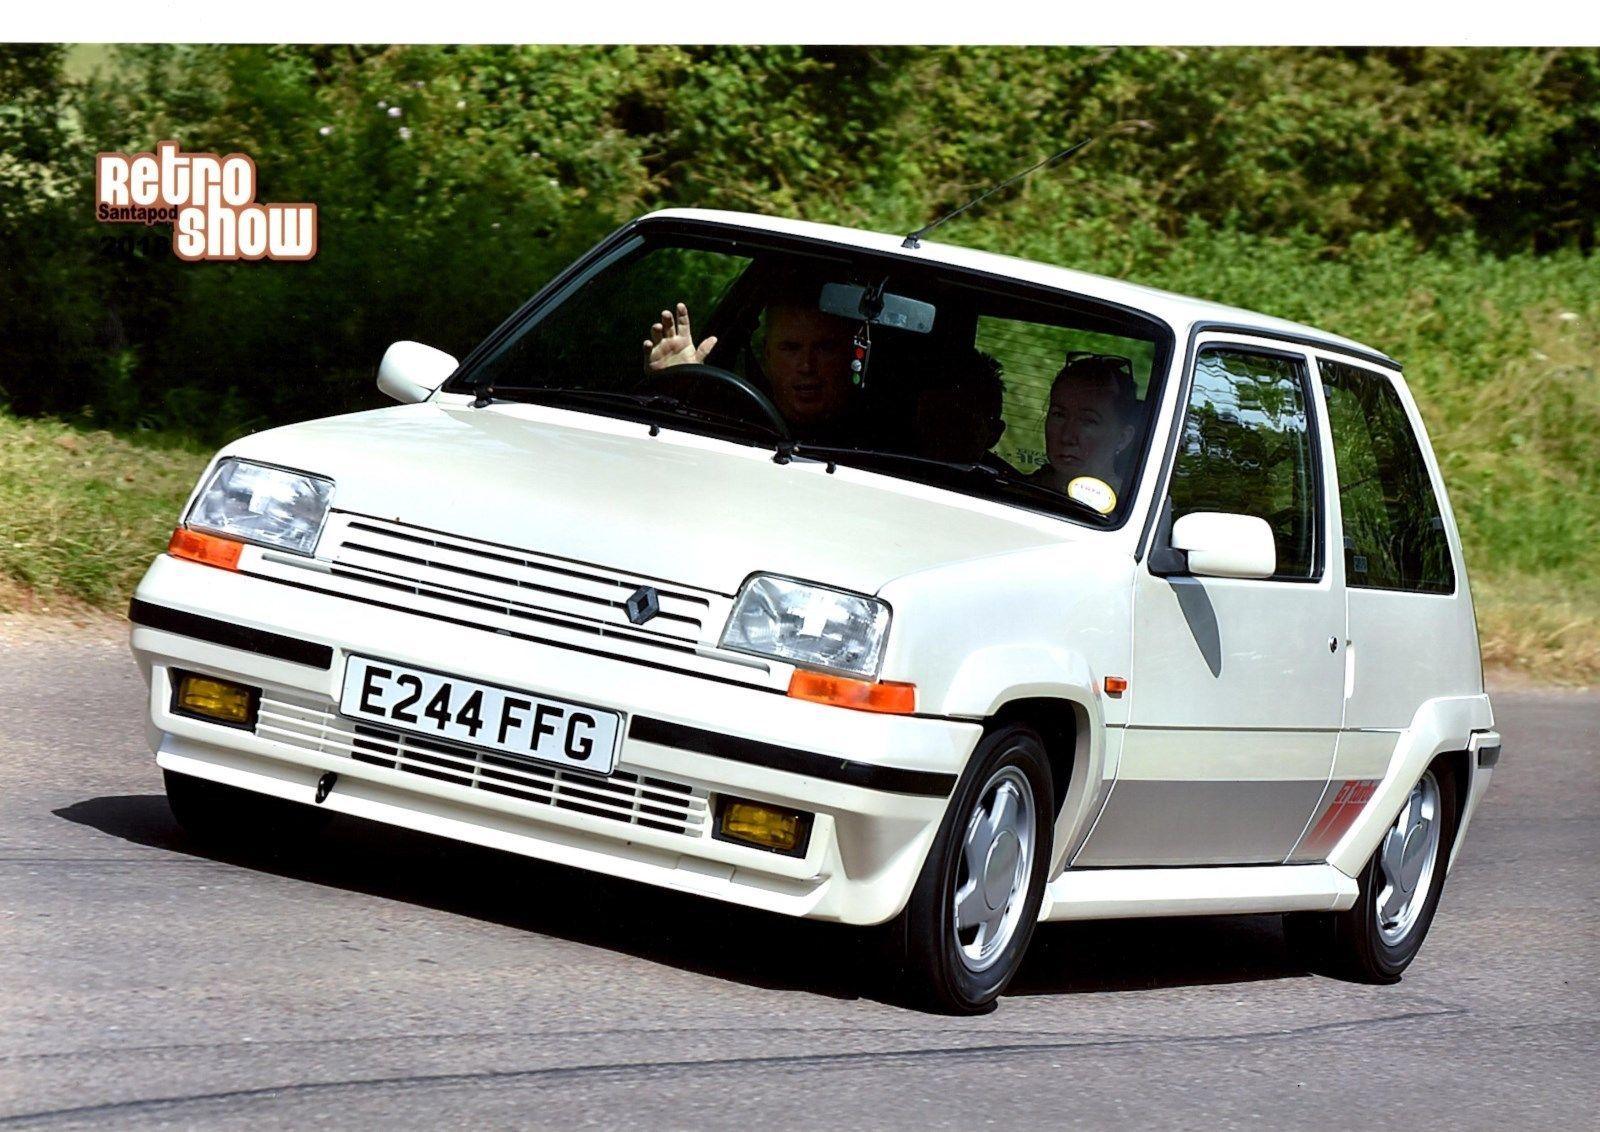 Renault 5 Gt Turbo Phase 2 Pearl White 1988 Renault 5 Gt Turbo Renault 5 Renault